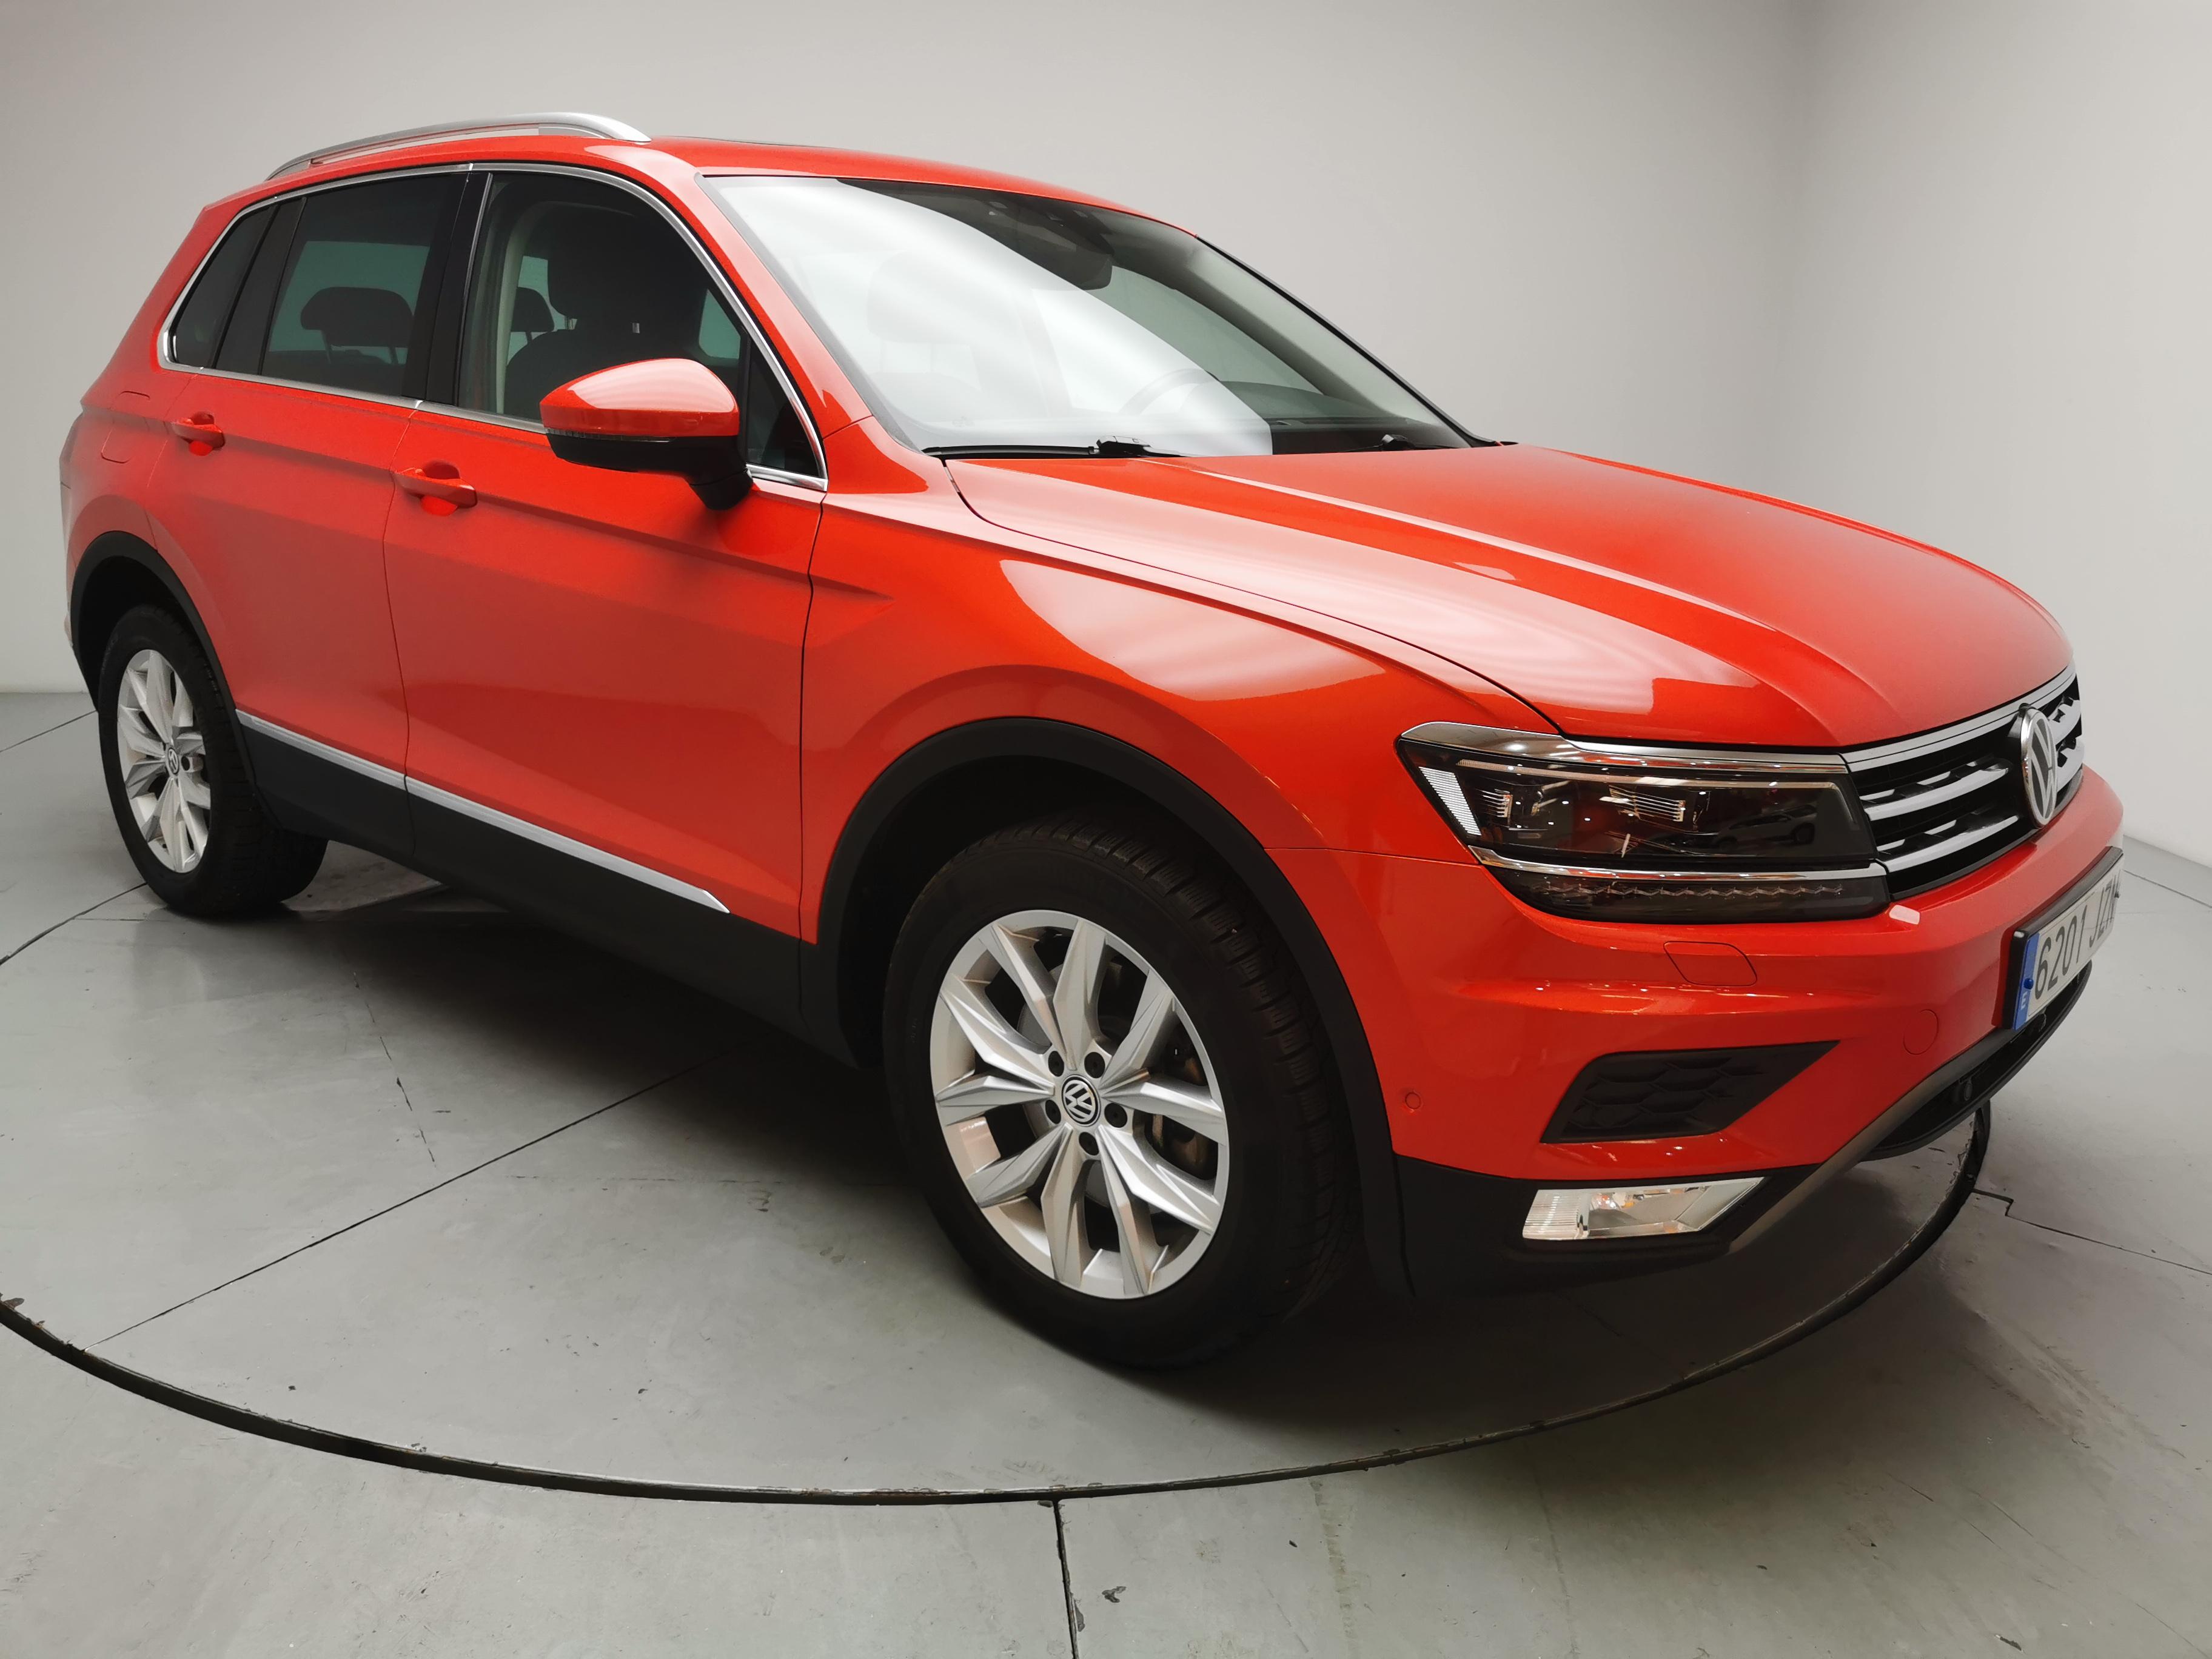 Volkswagen Tiguan ocasión segunda mano 2017 Gasolina por 28.900€ en Málaga